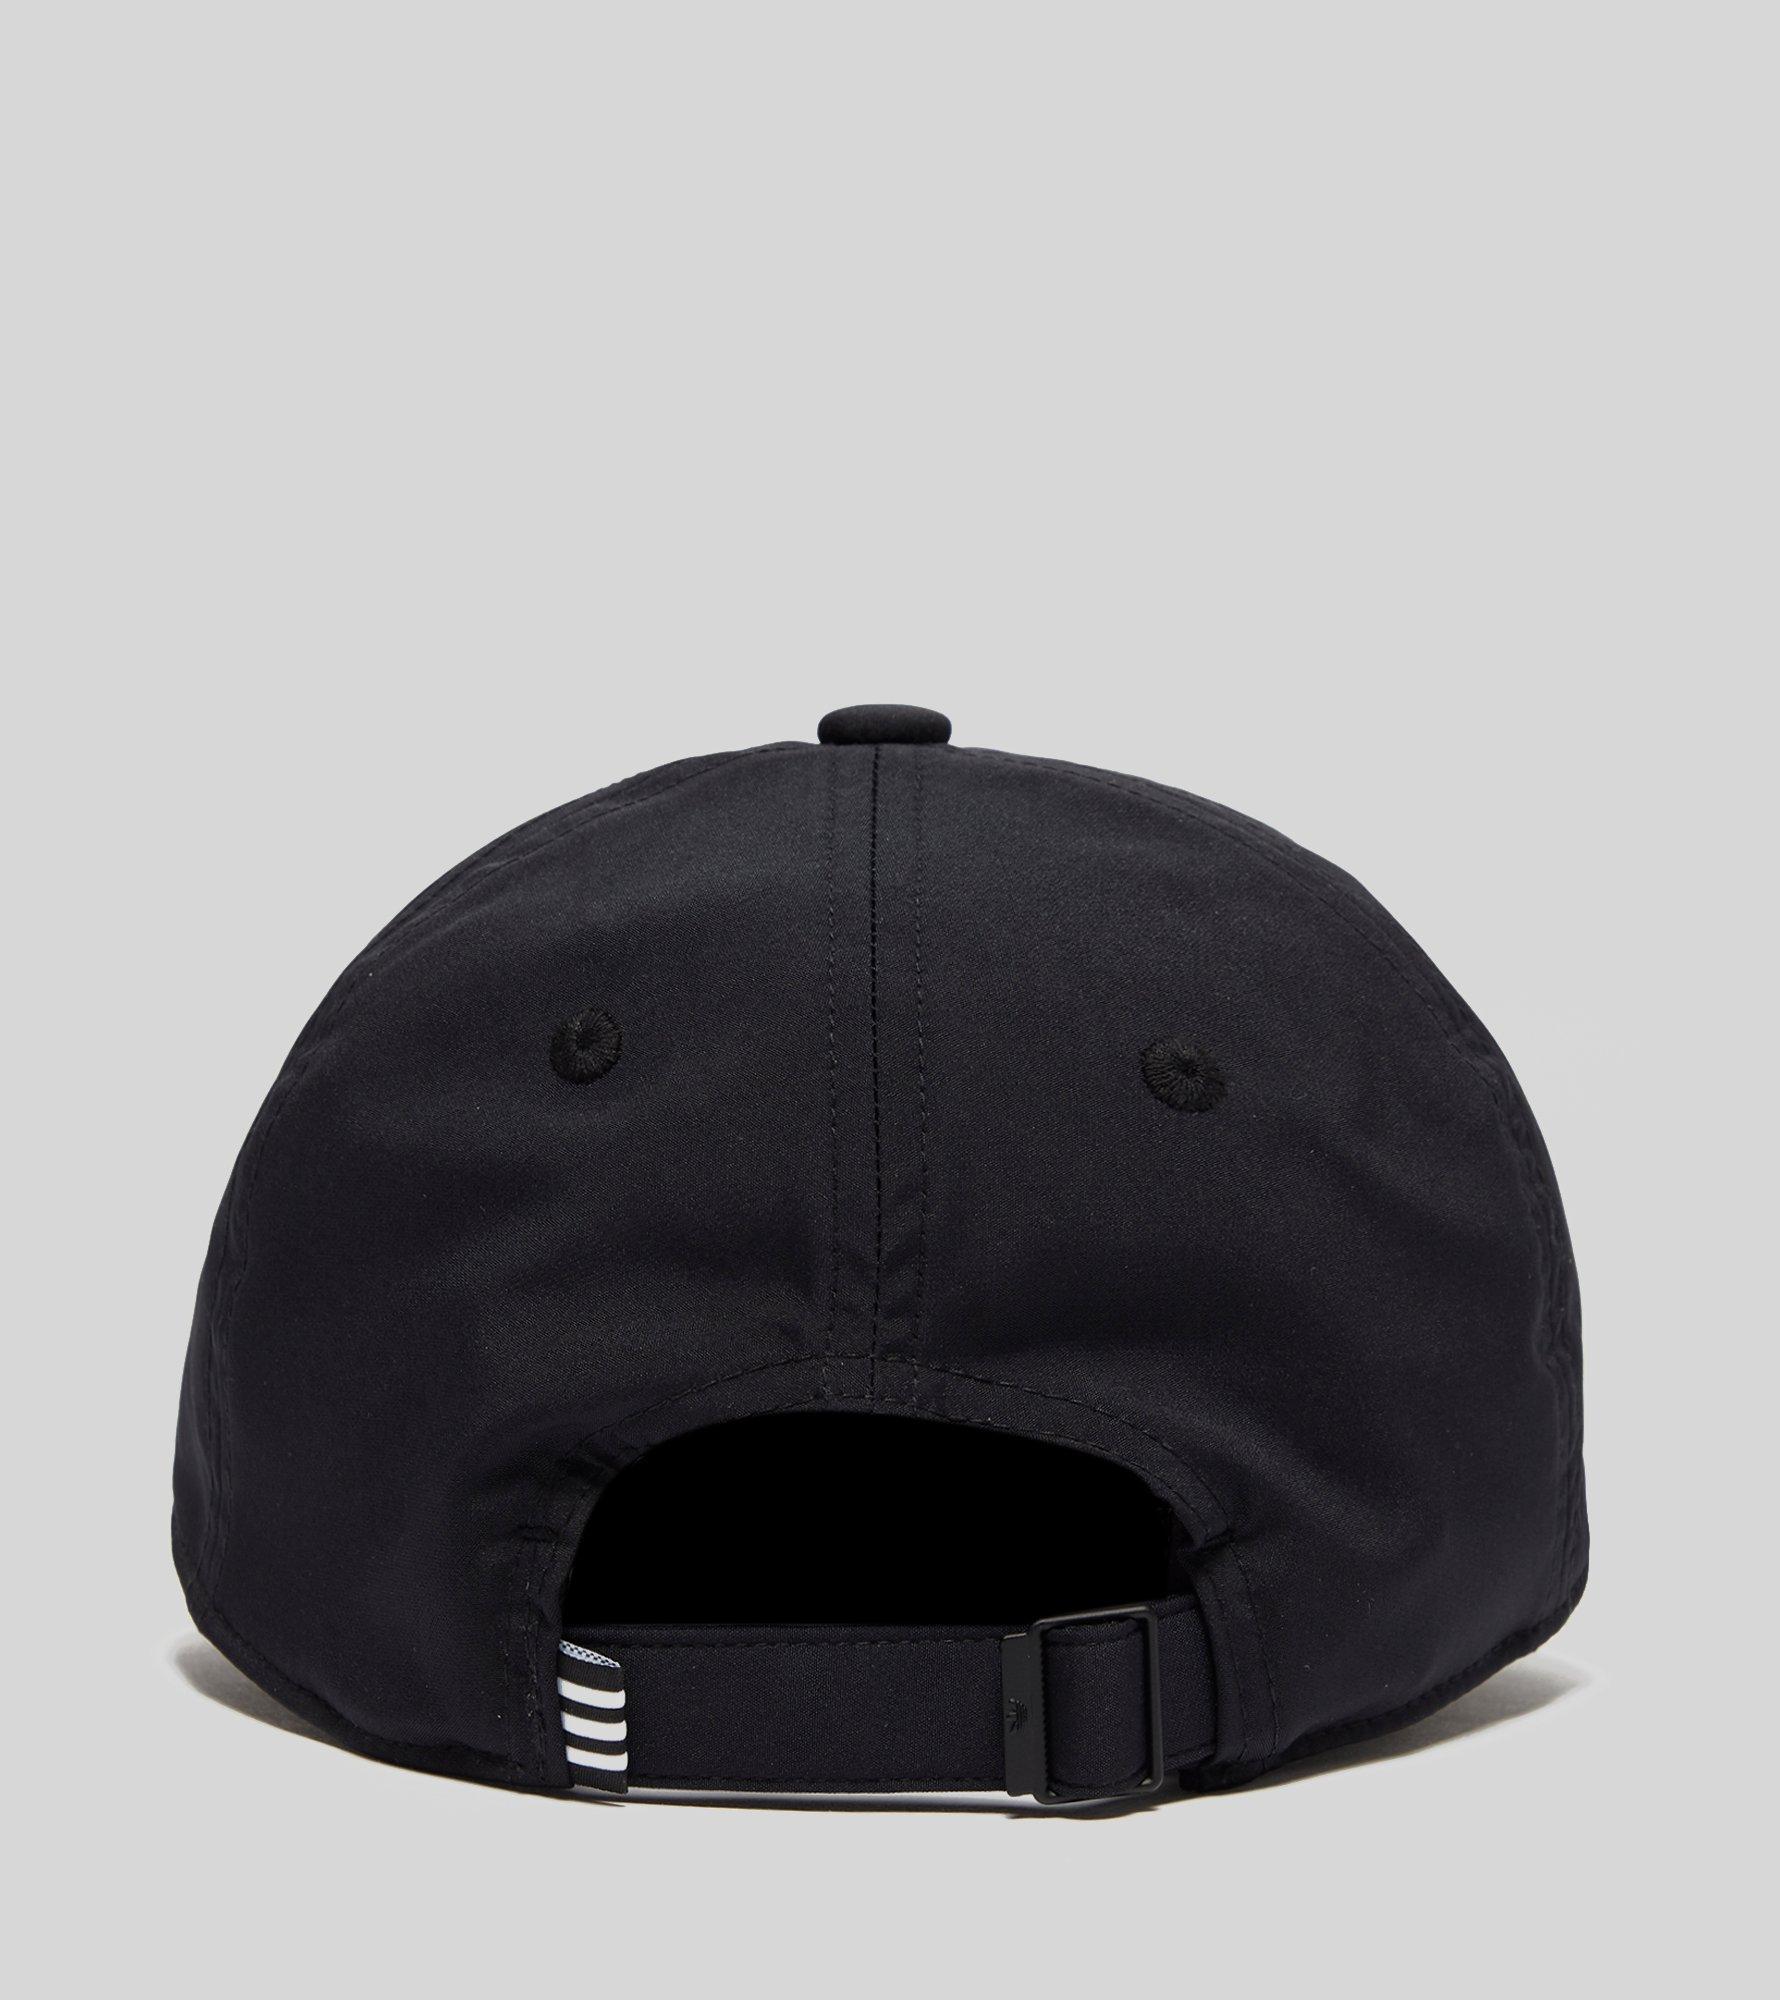 3d7561e0 Adidas Originals - Black Nmd Running Cap for Men - Lyst. View fullscreen